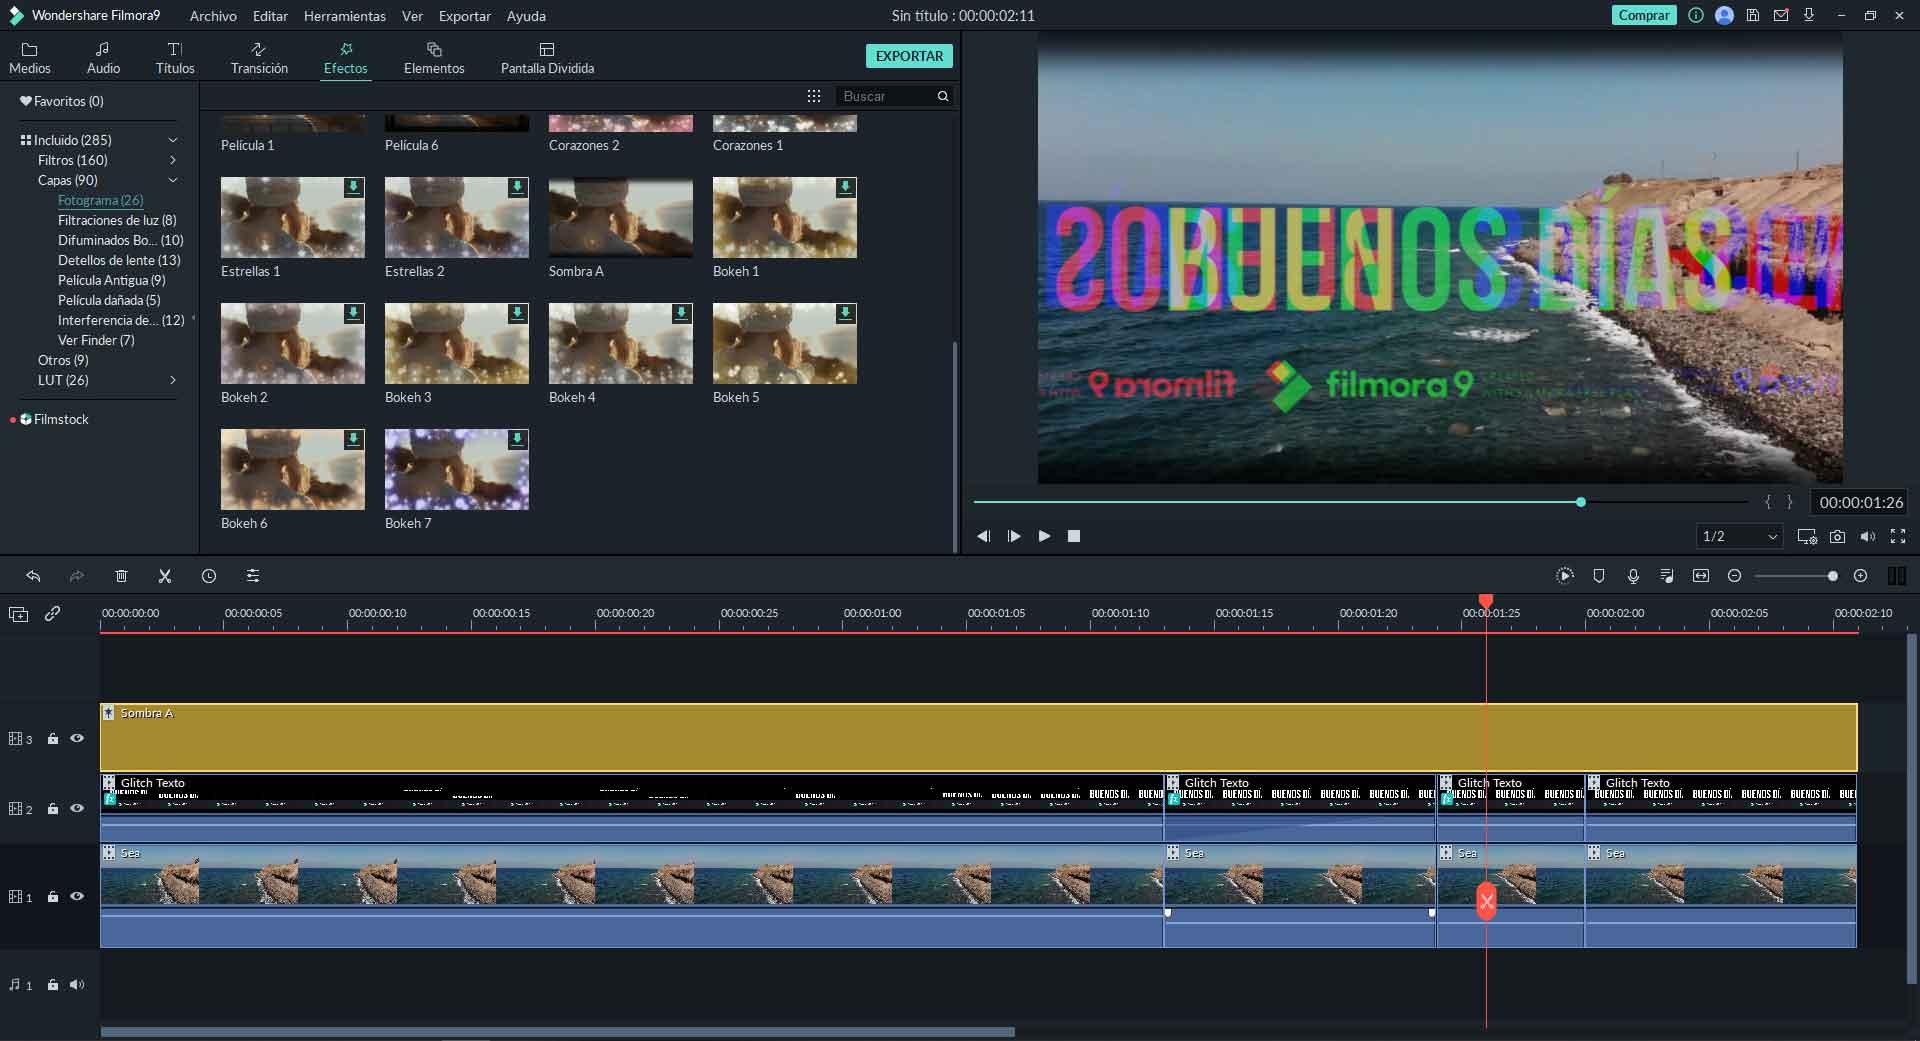 glitch text on video